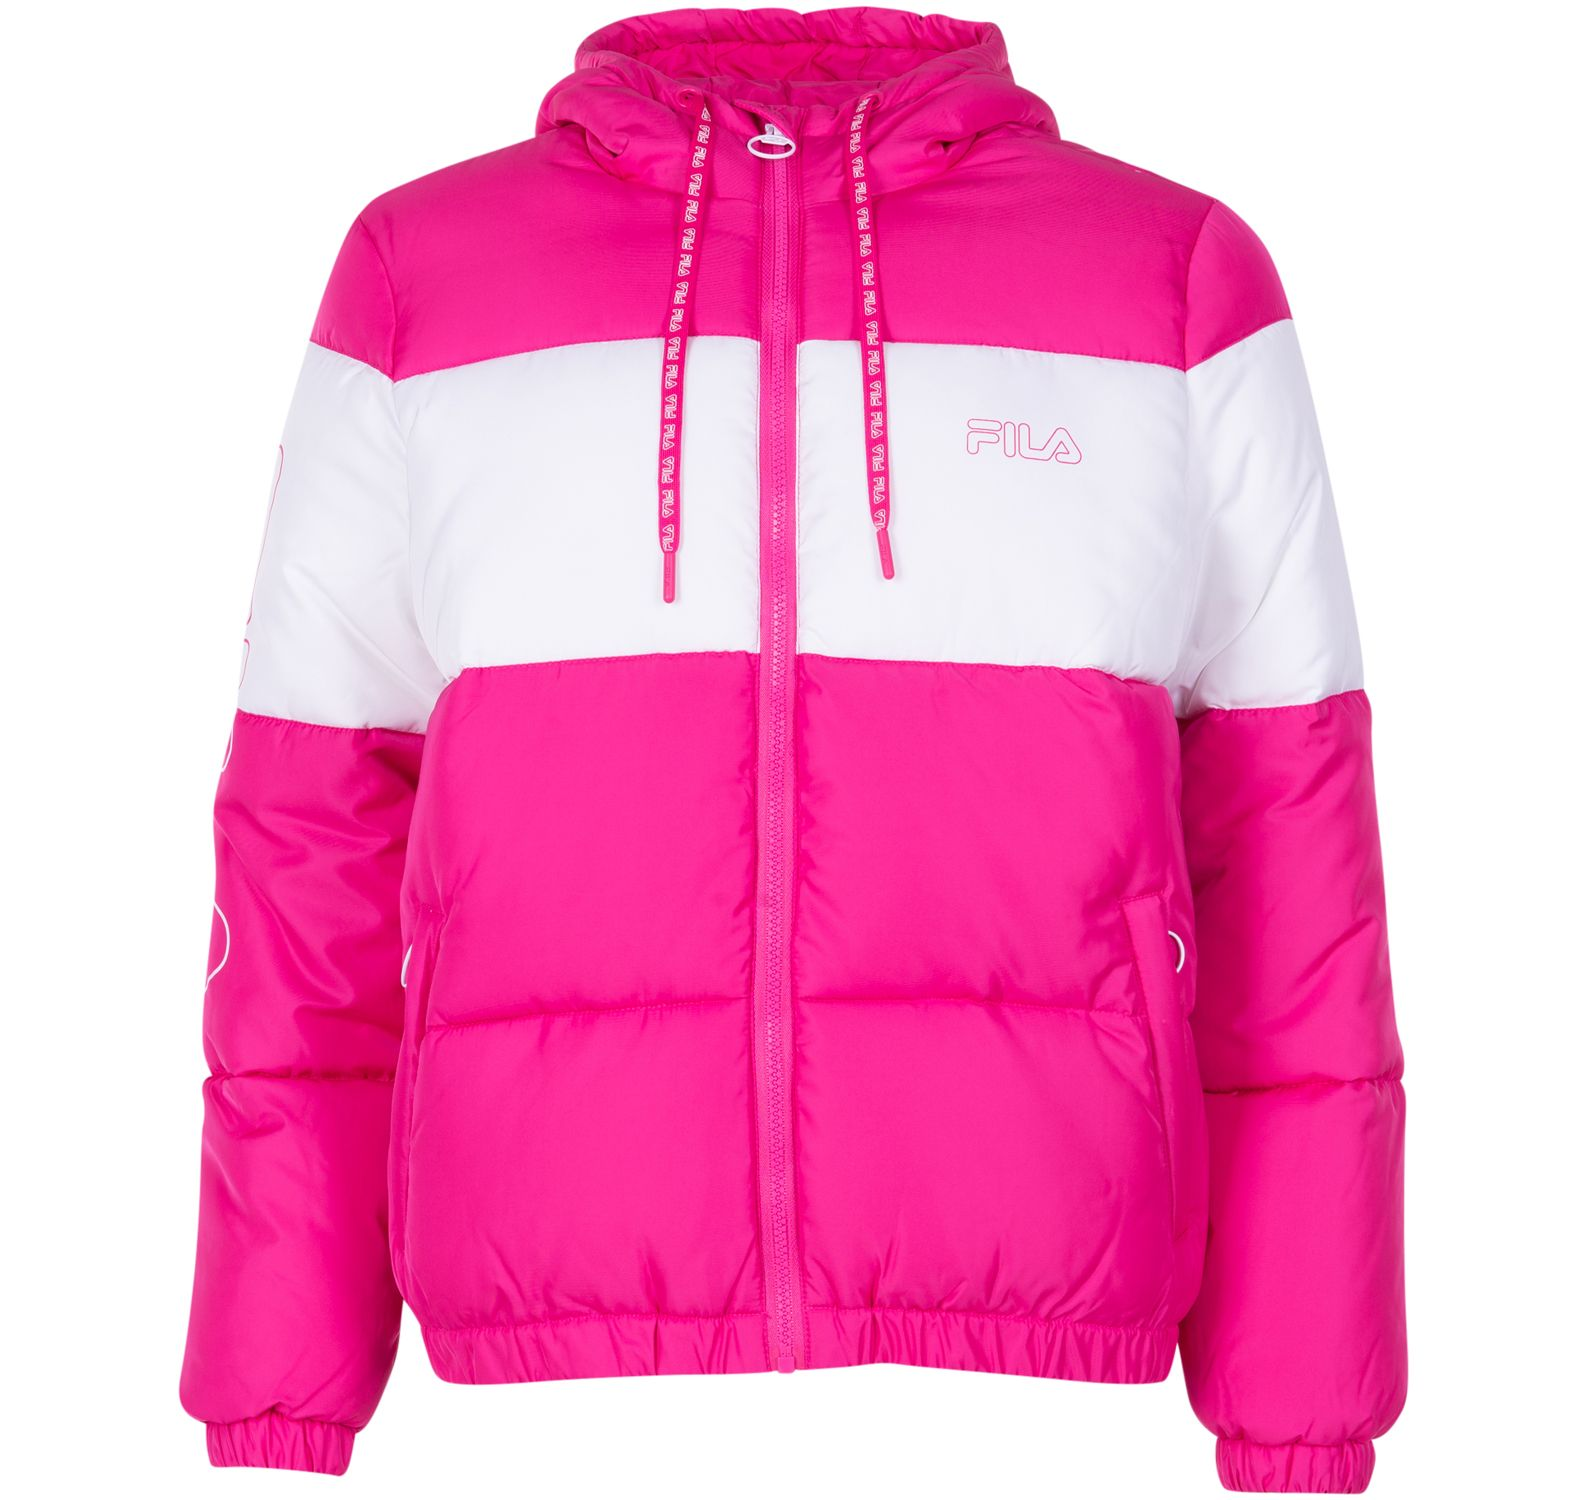 Addy Oversized Padded Jacket, Beetroot Purple, M,  Fila Dam